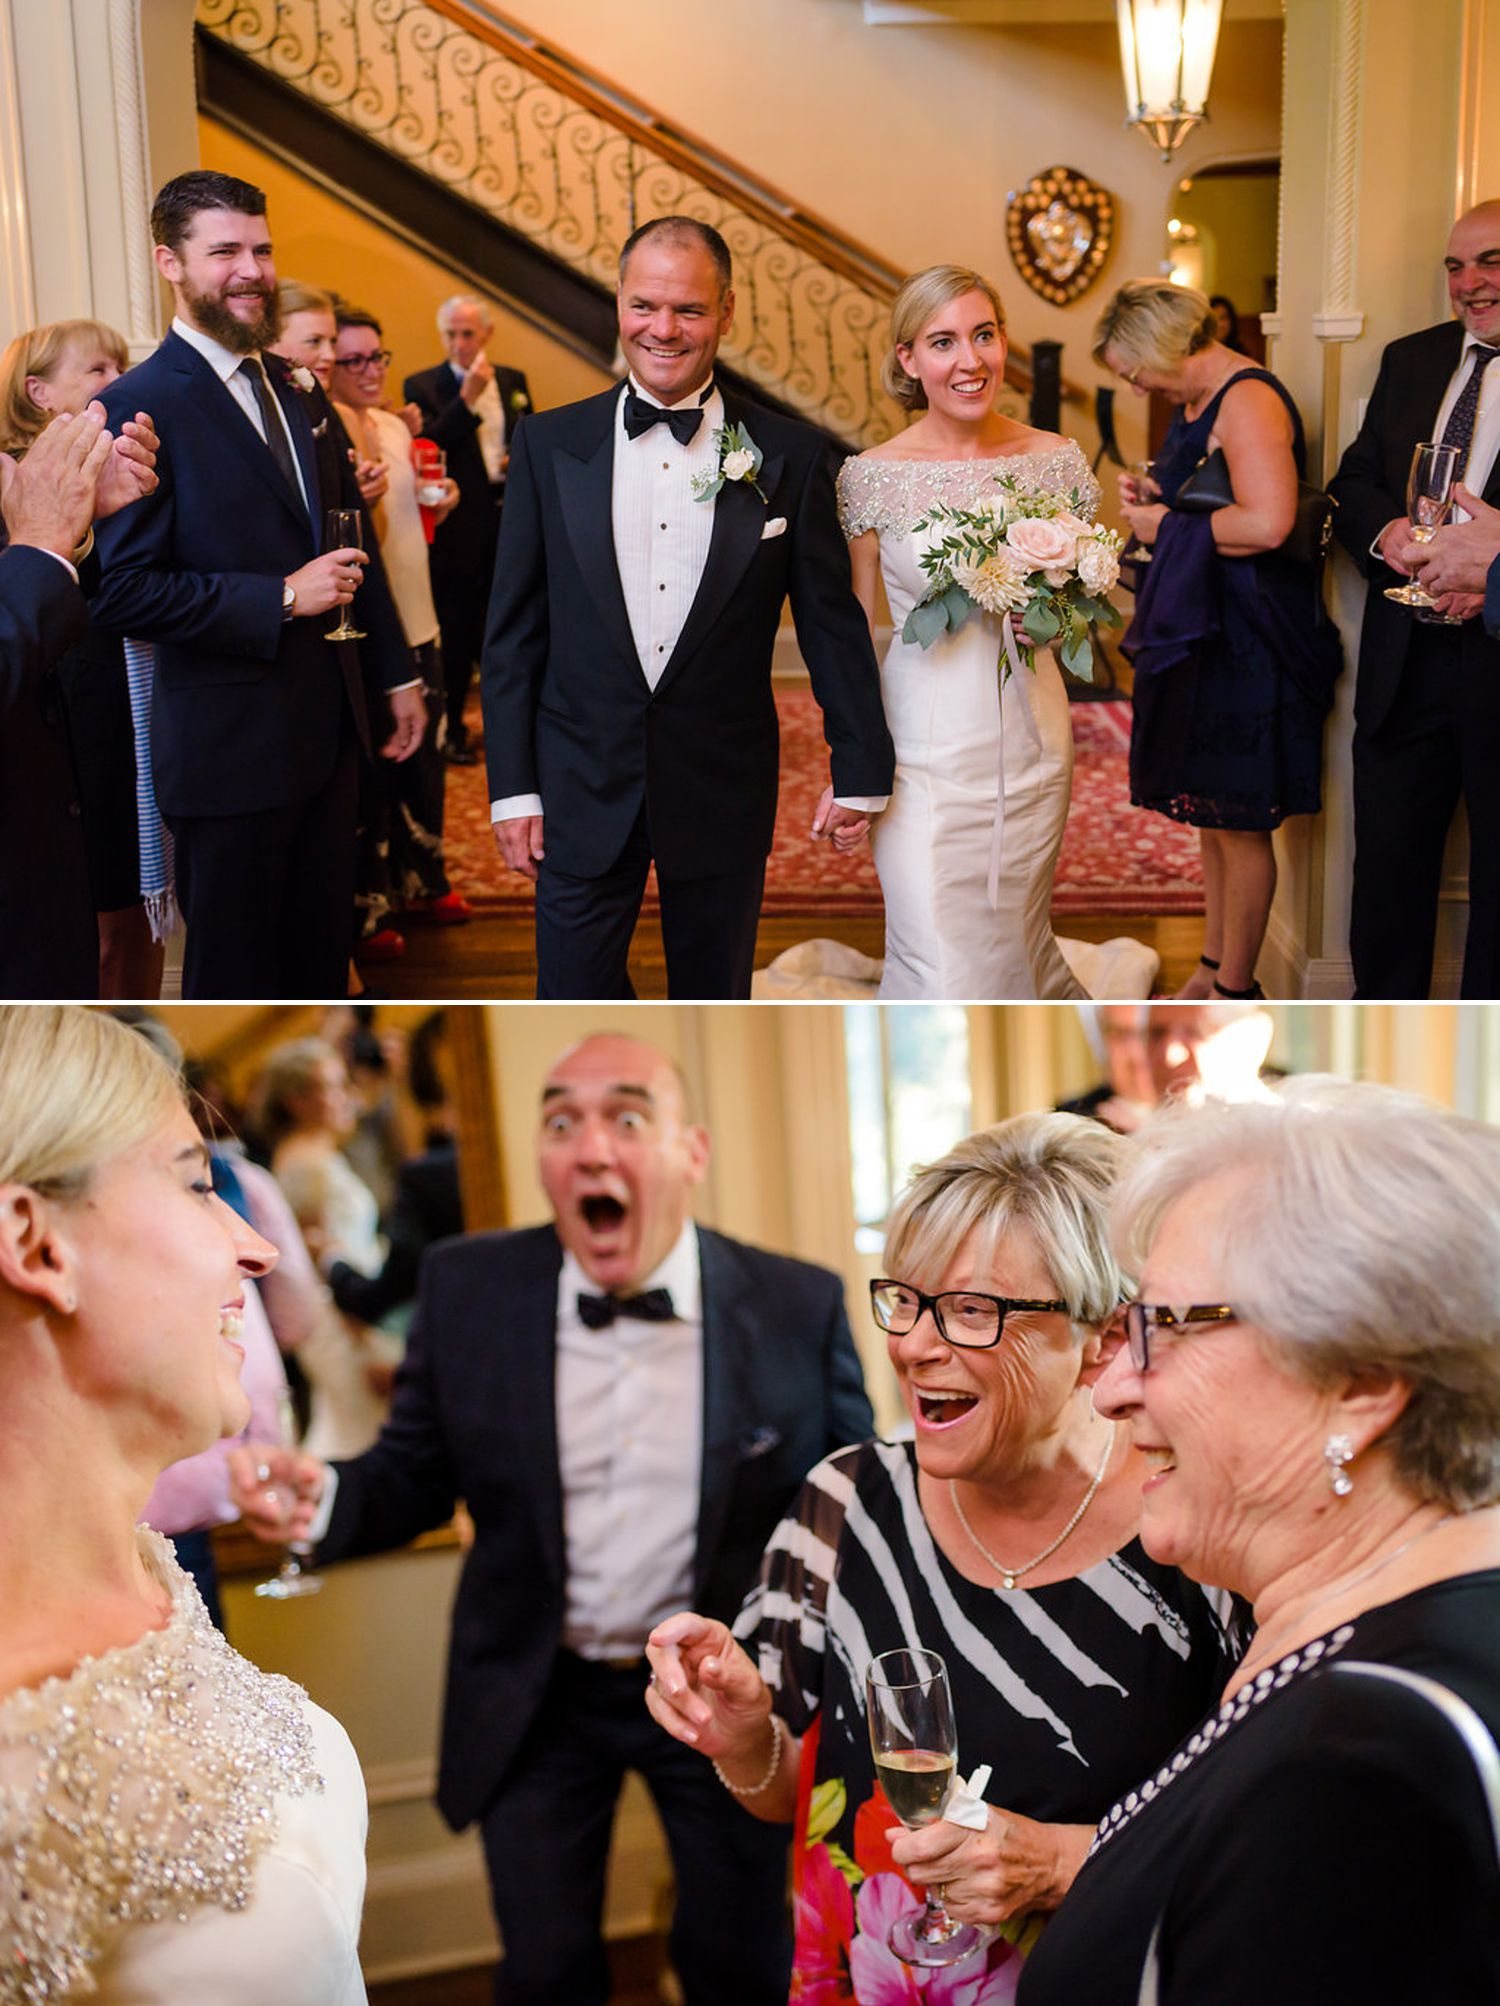 photographs of a wedding ceremony inside the royal ottawa golf club